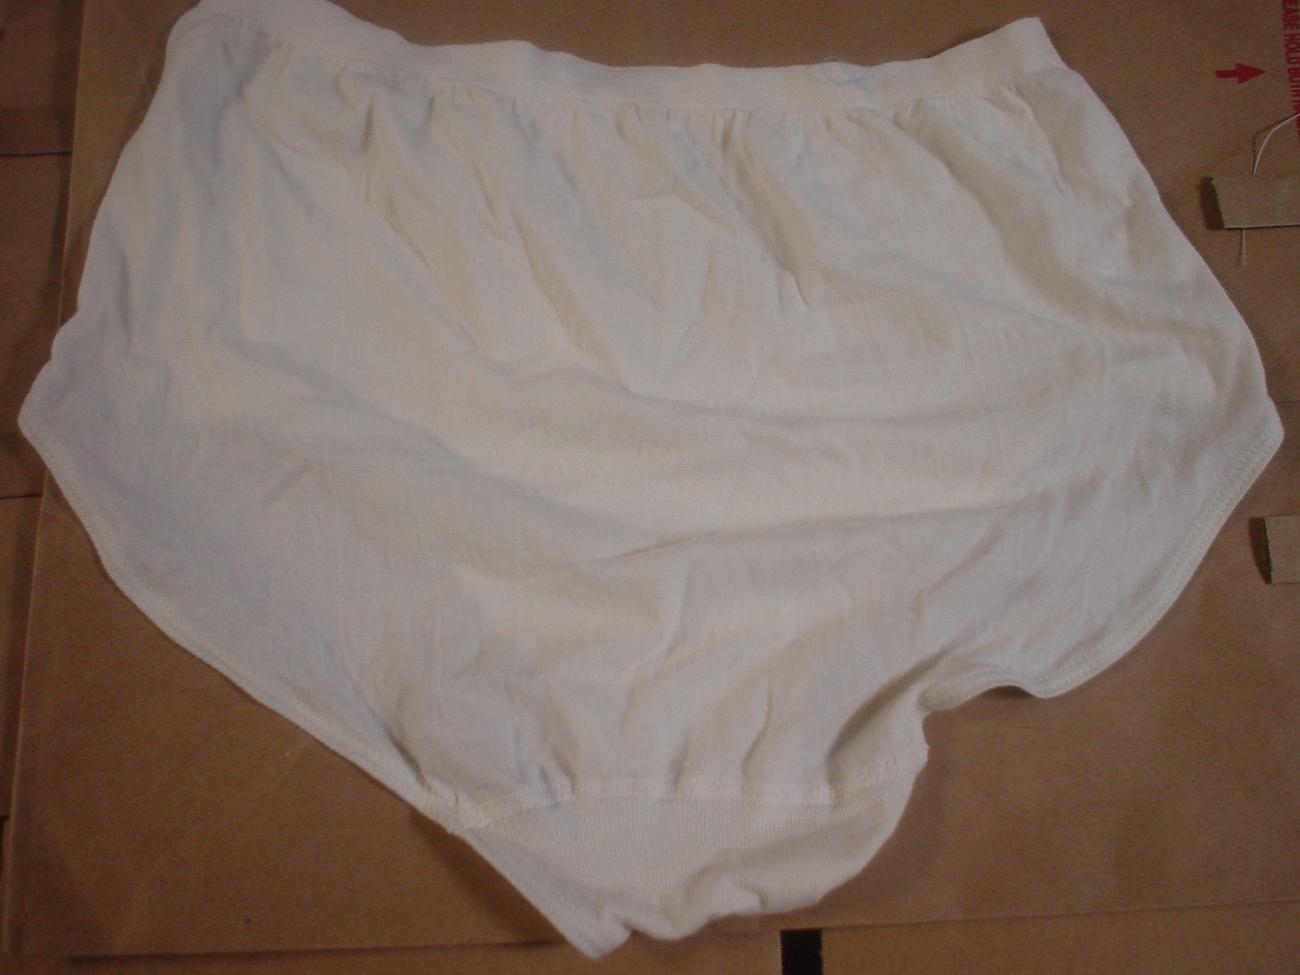 Jockey Seamfree Panty 7/Lrg or 8/XLrg Ivory SP-Slightly Imperfect Lot of 2 NWOT